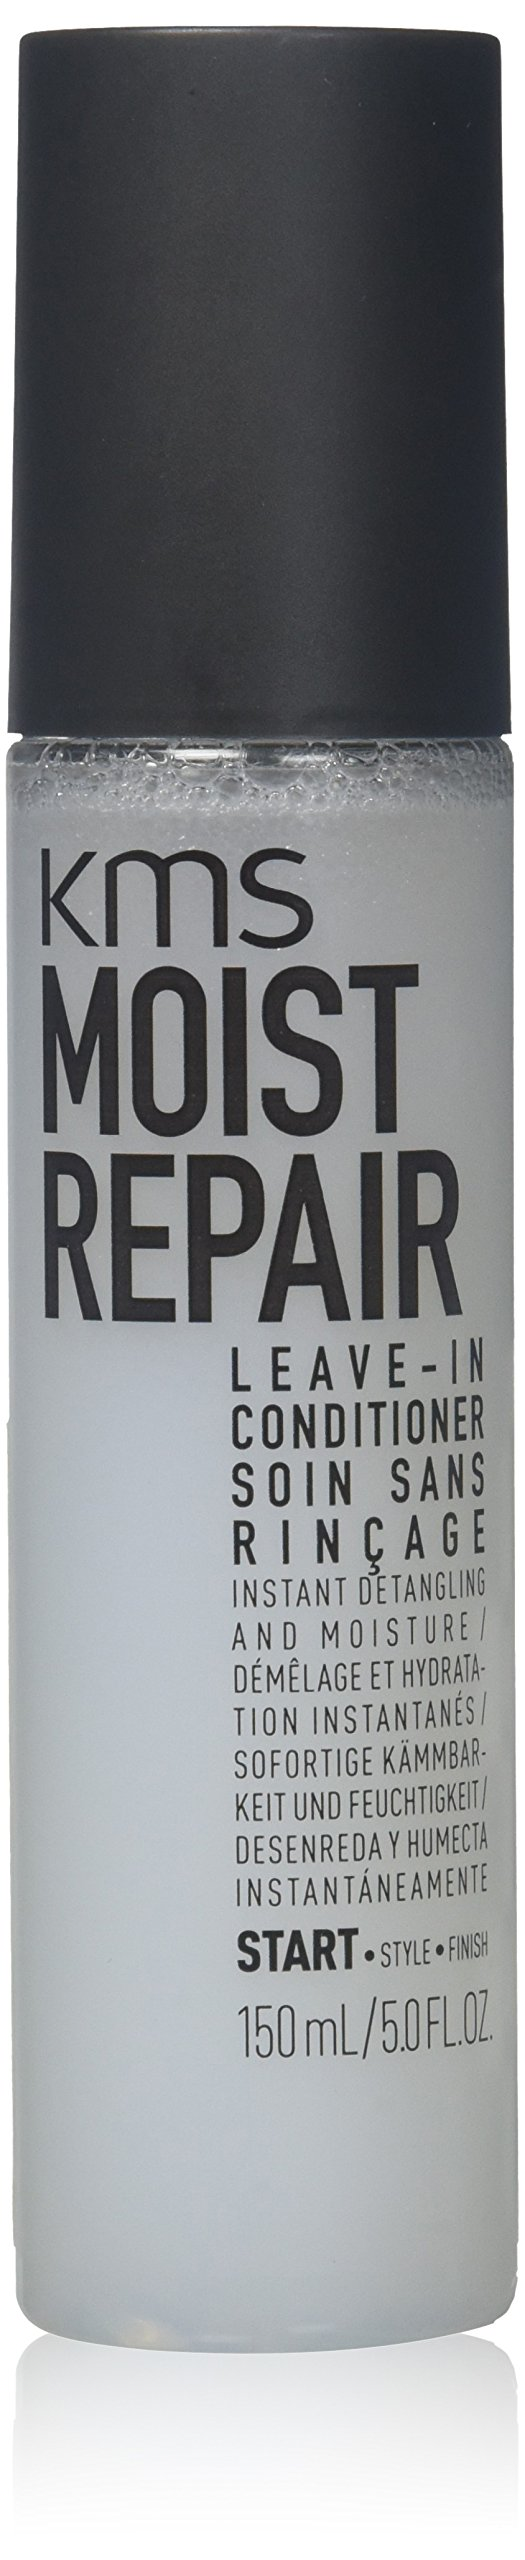 KMS California Moist Repair Leave In Conditioner